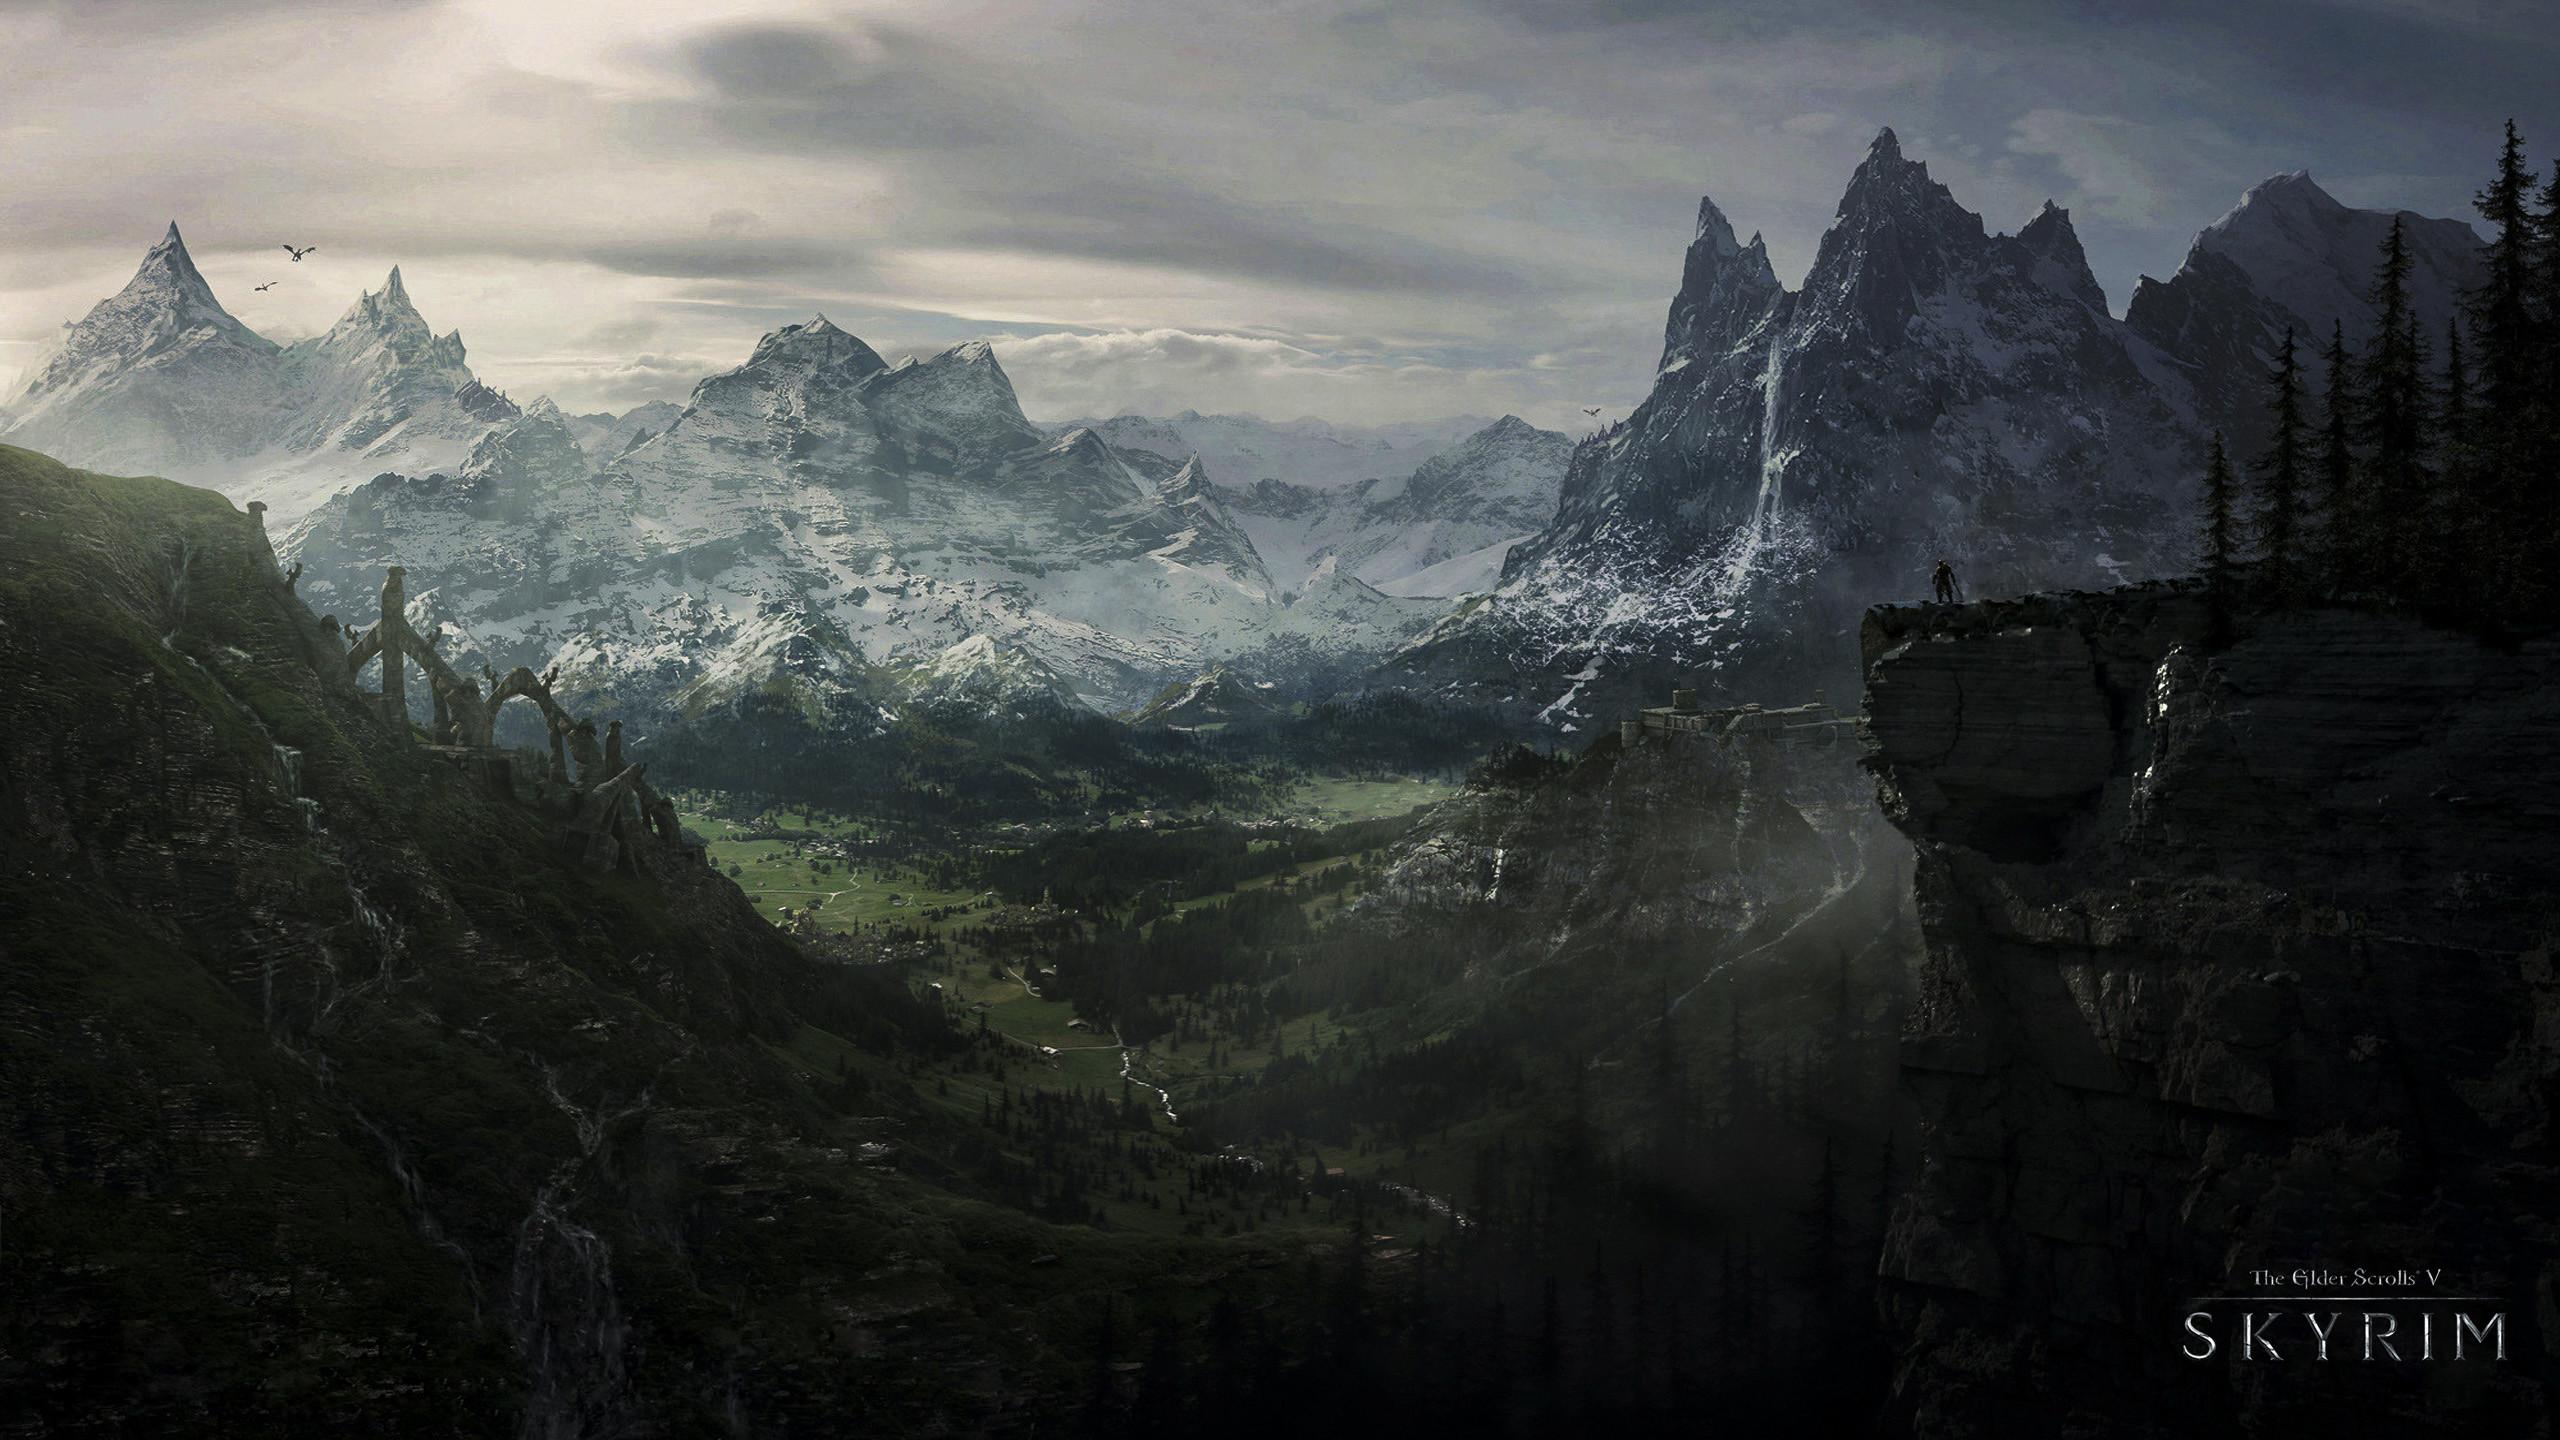 The Elder Scrolls V Skyrim HD Wallpapers Backgrounds   HD Wallpapers    Pinterest   Skyrim, Wallpaper and Wallpaper backgrounds